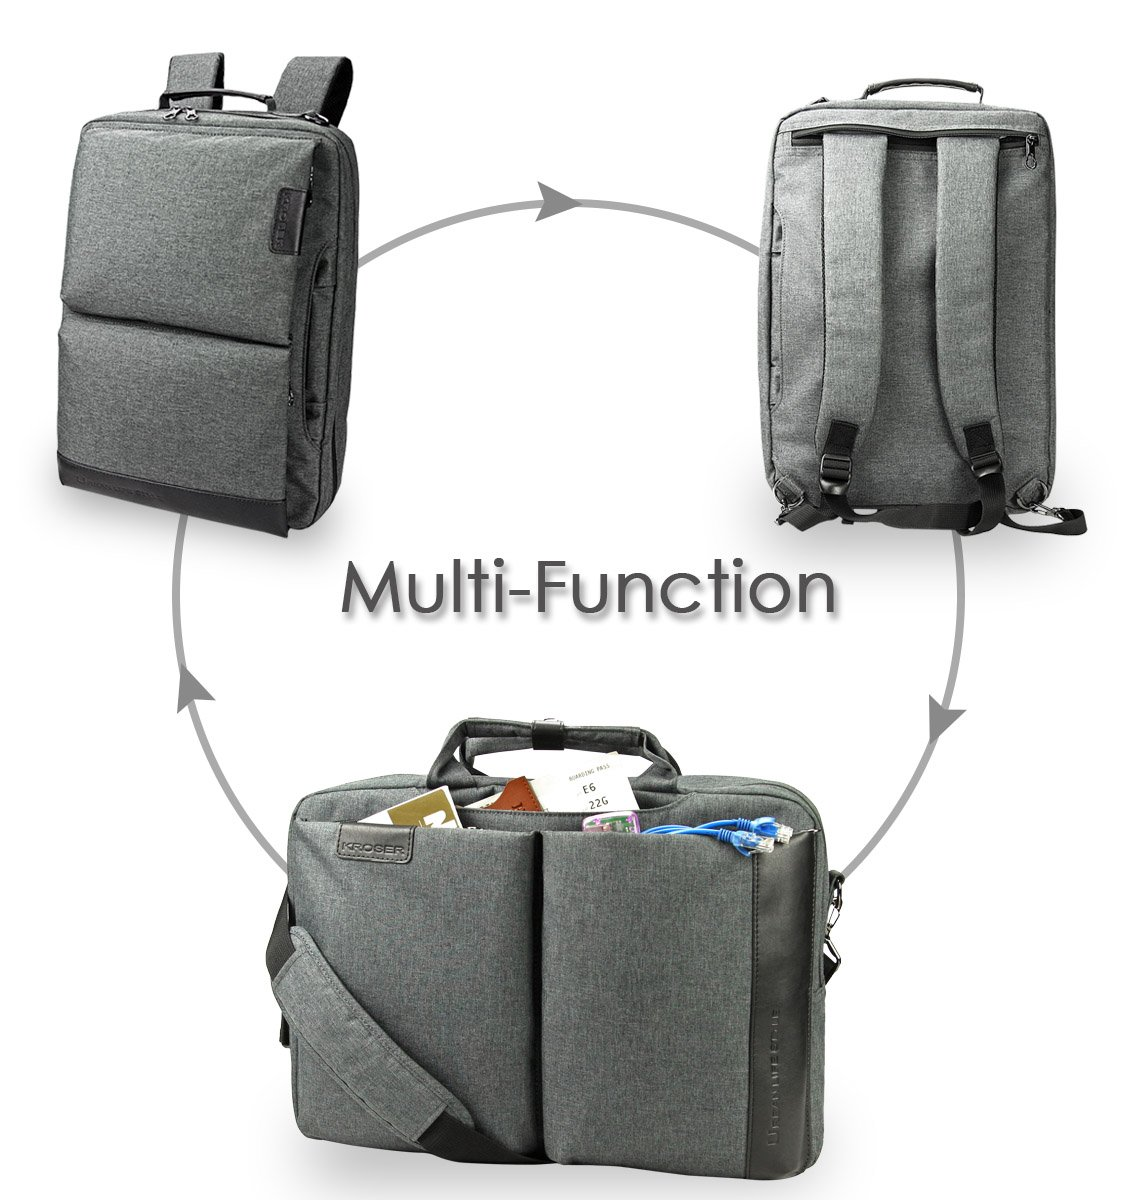 70% off Multi-Function 2 in 1 Computer Backpack Rucksack Urban Laptop Bag